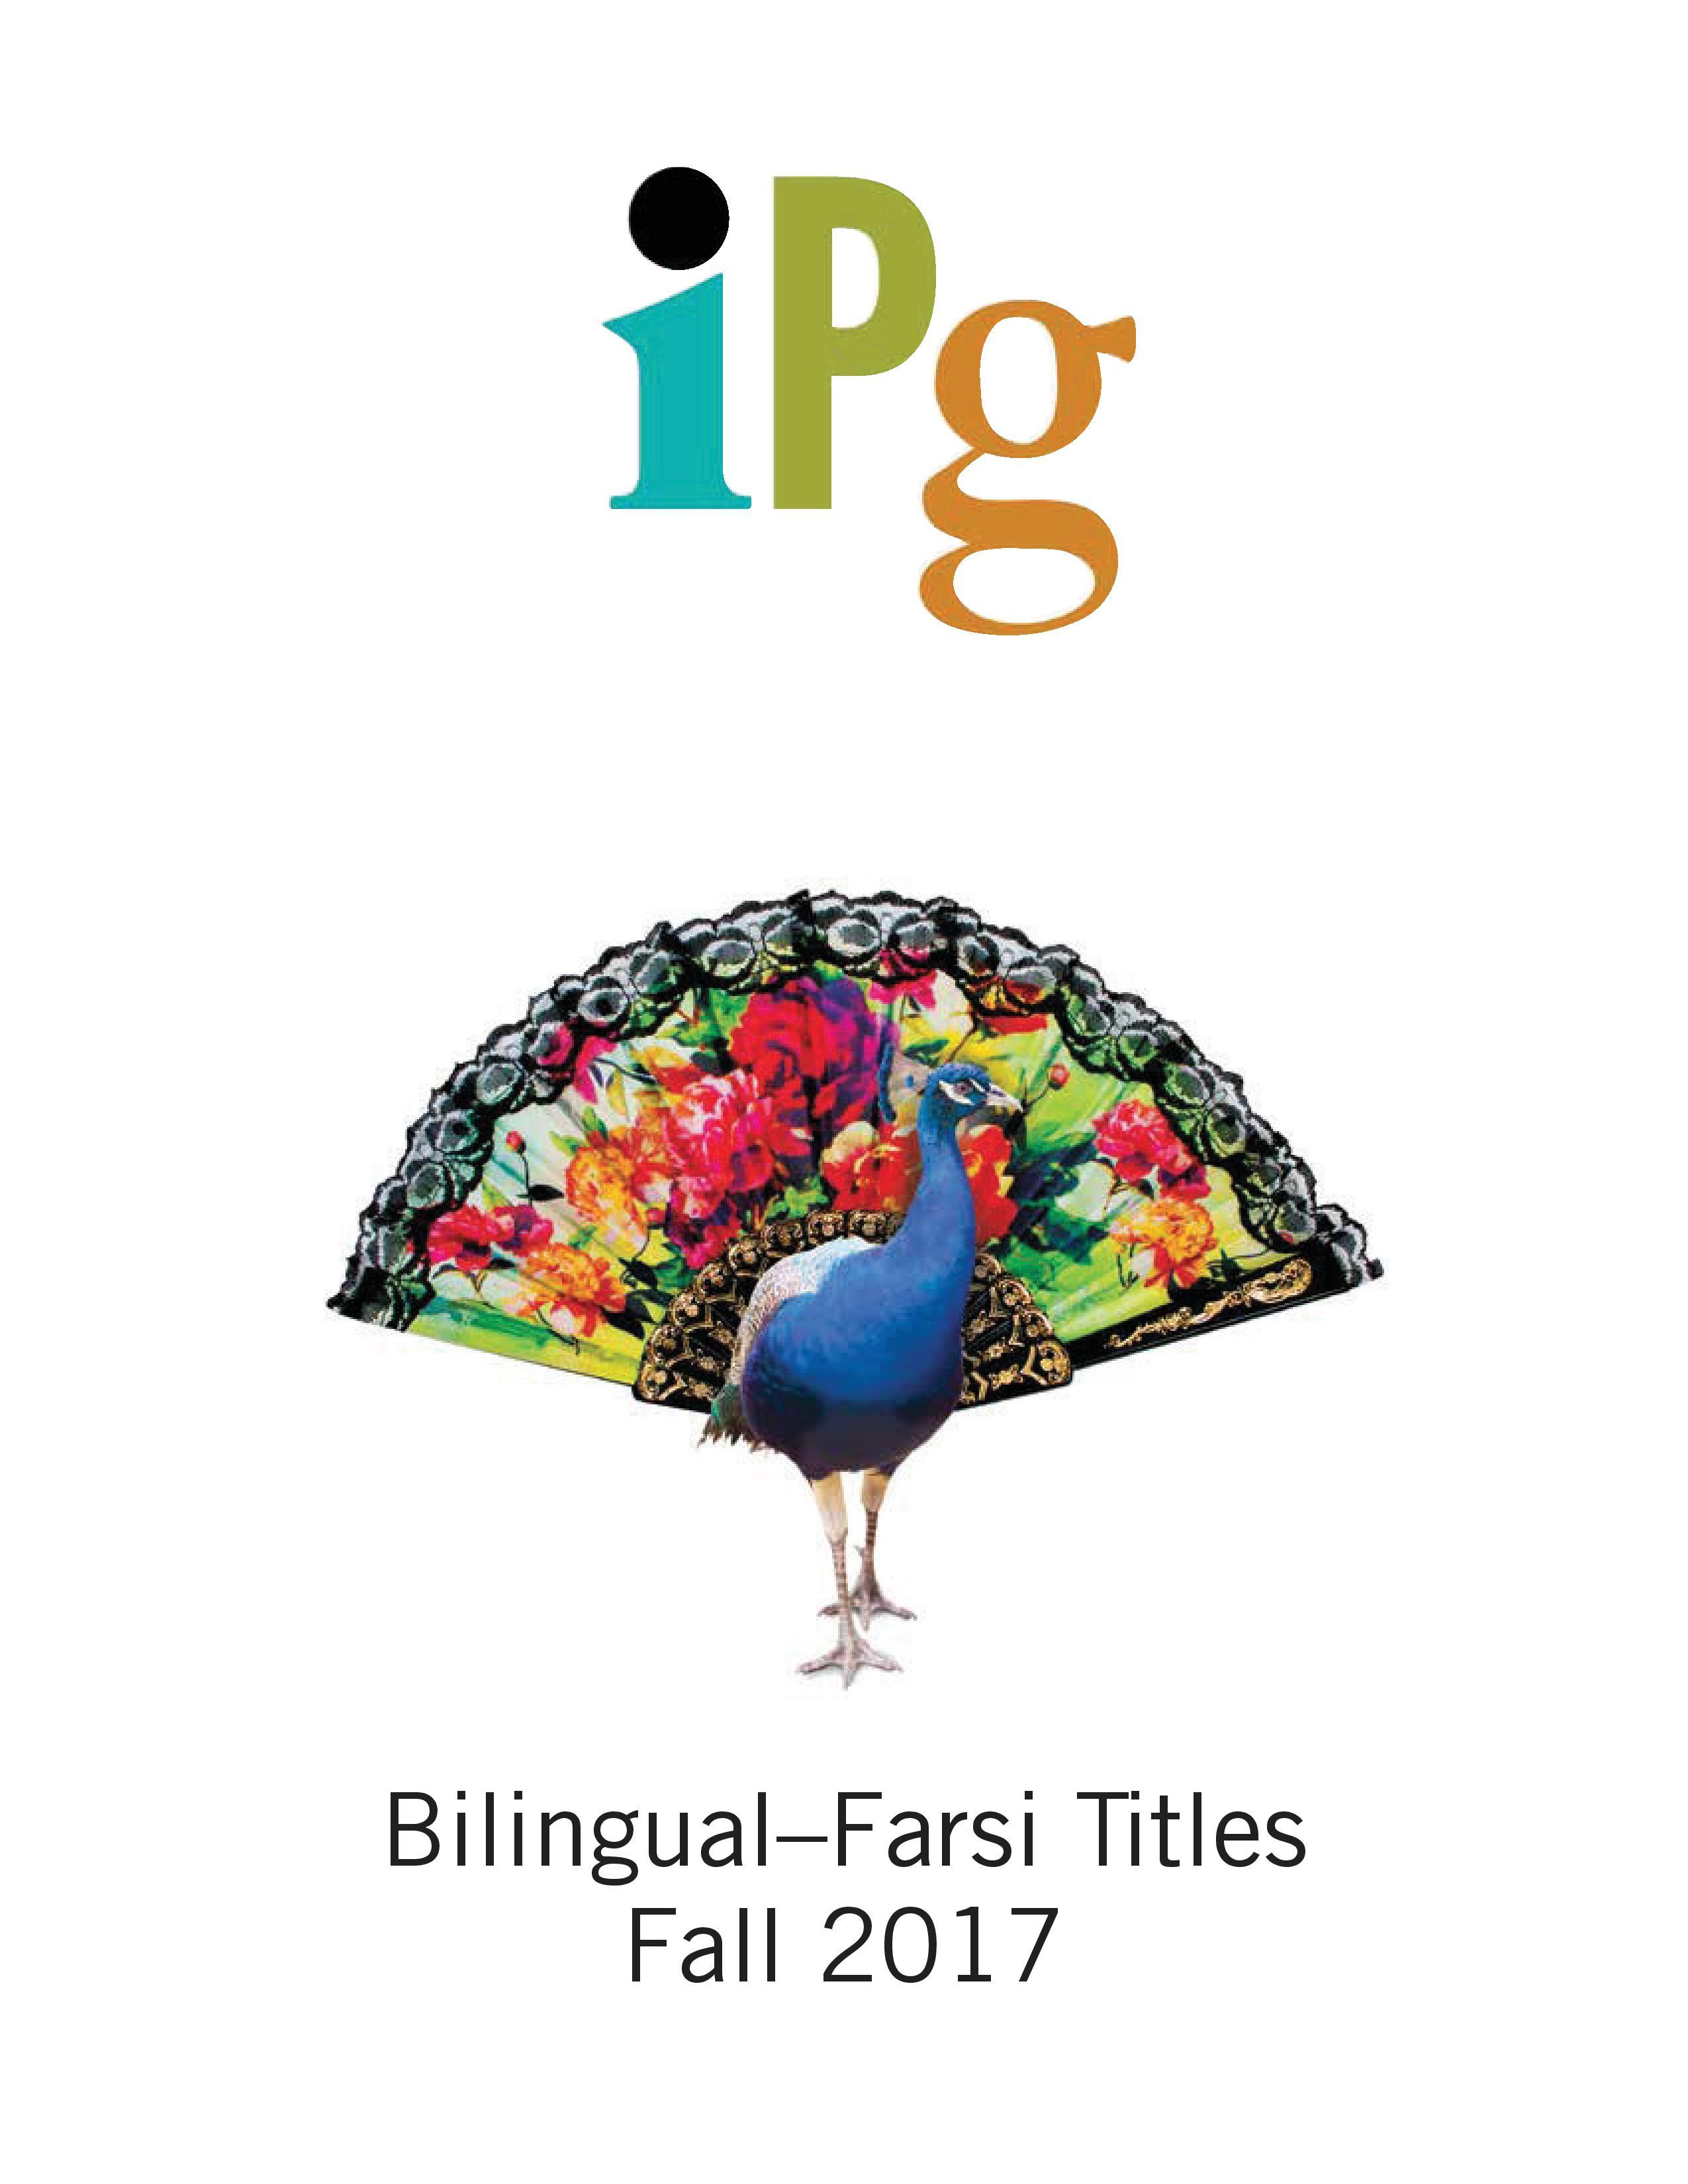 Bilingual Farsi Titles